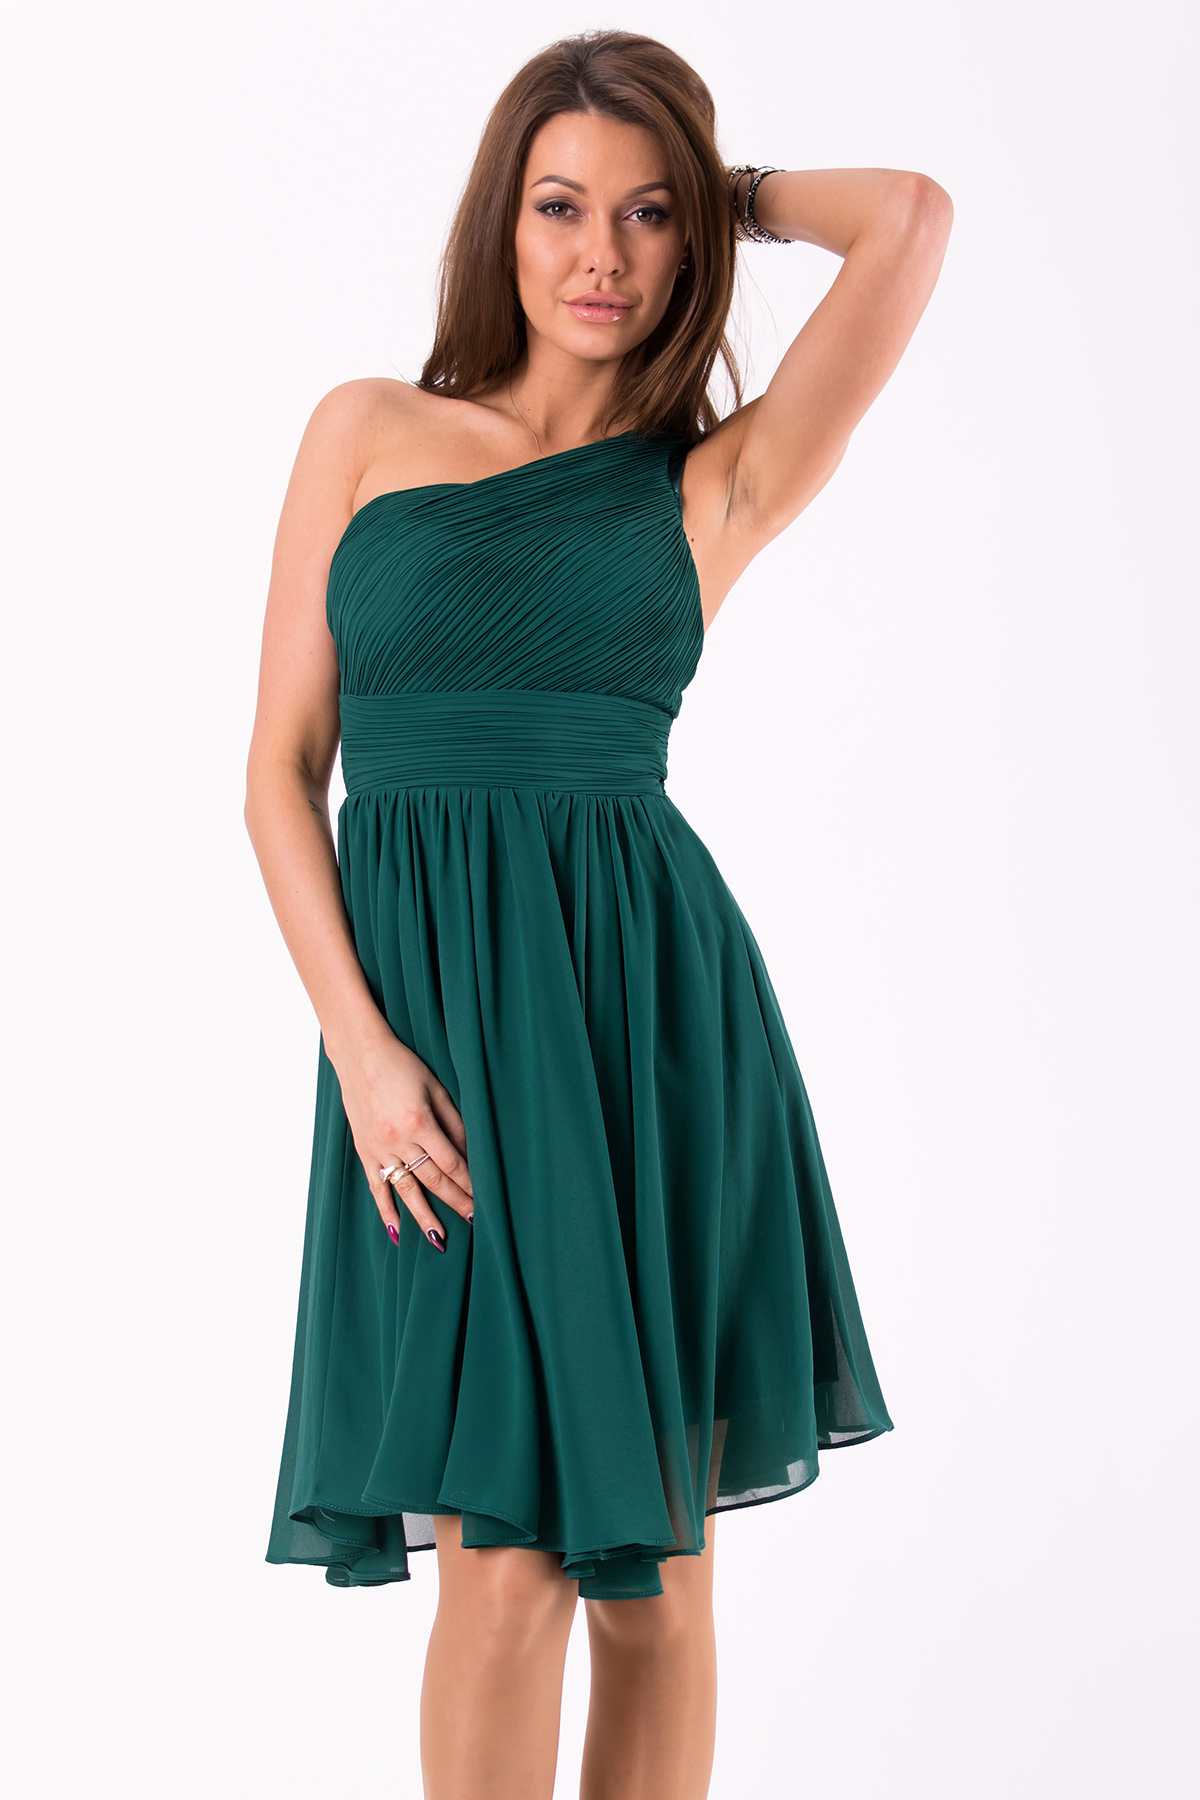 EVA&LOLA  roheline kleit